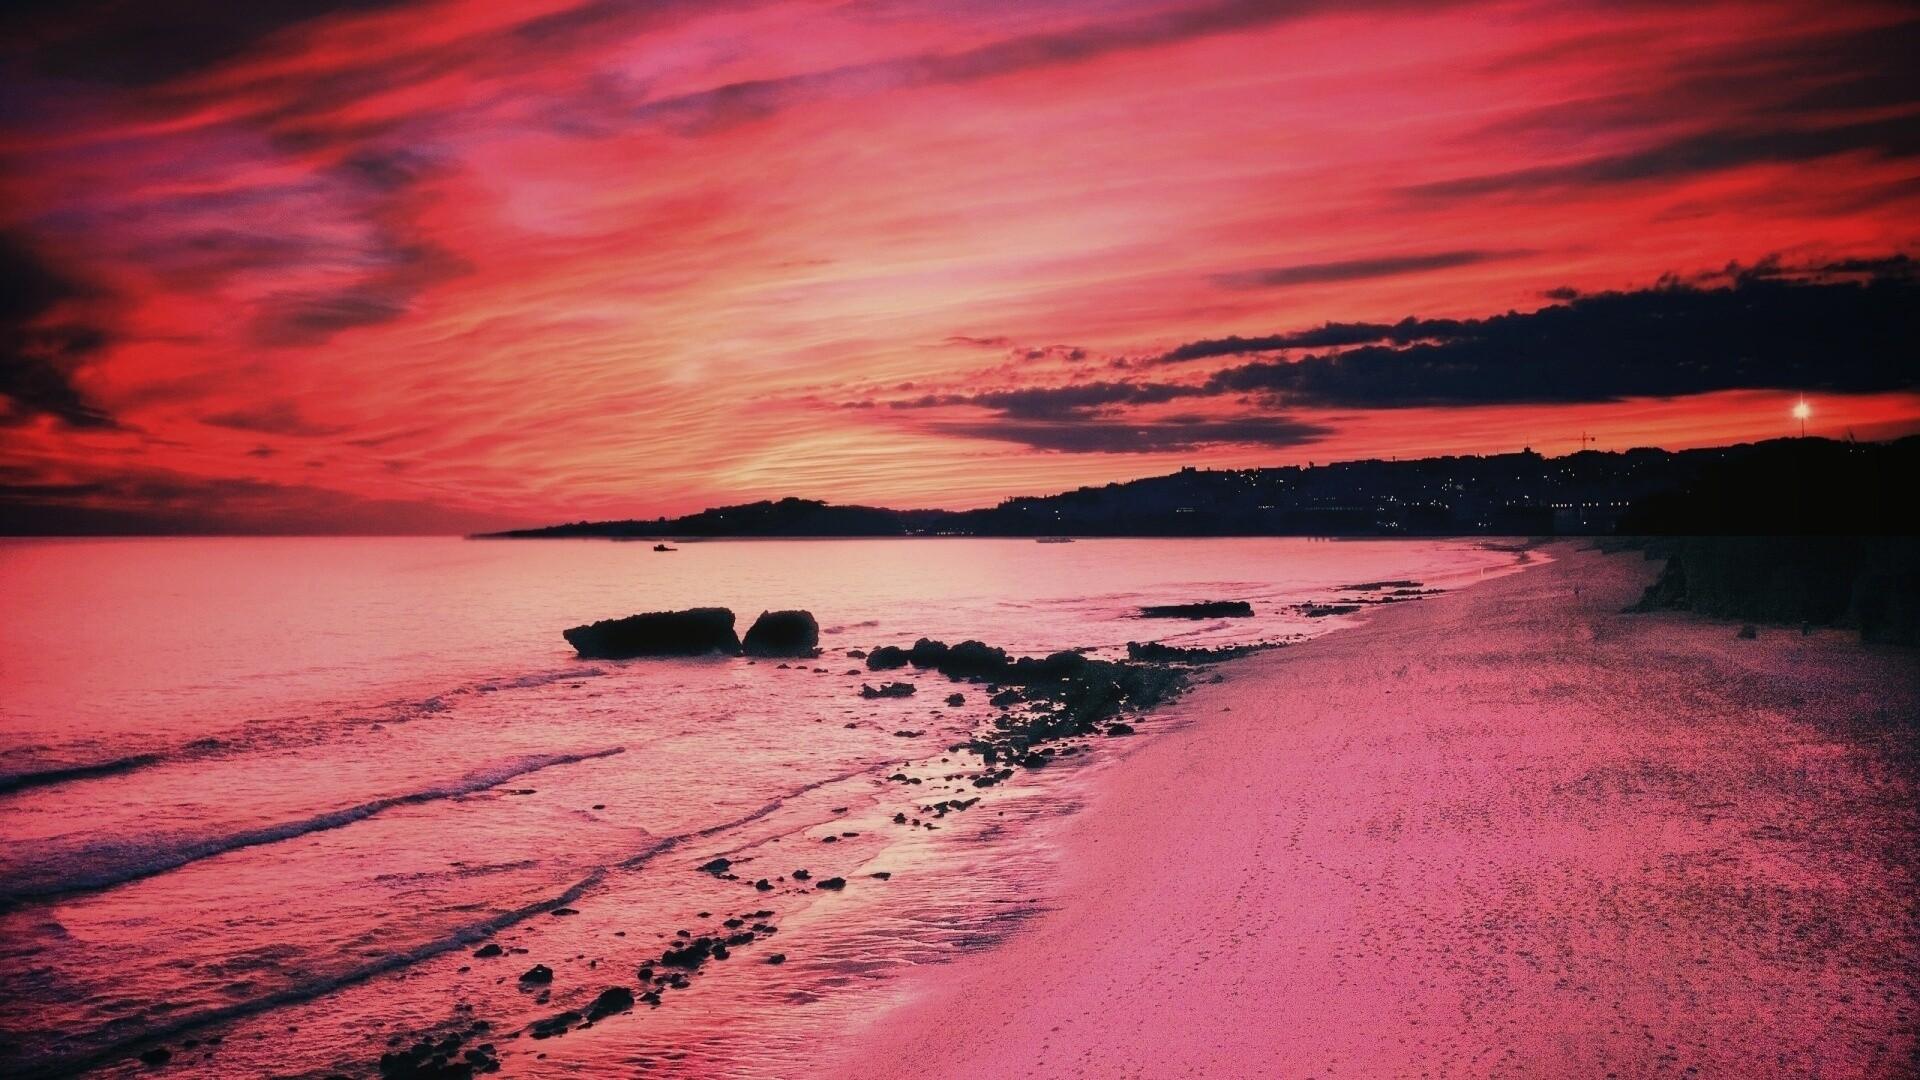 Pink Sunset PC Wallpaper